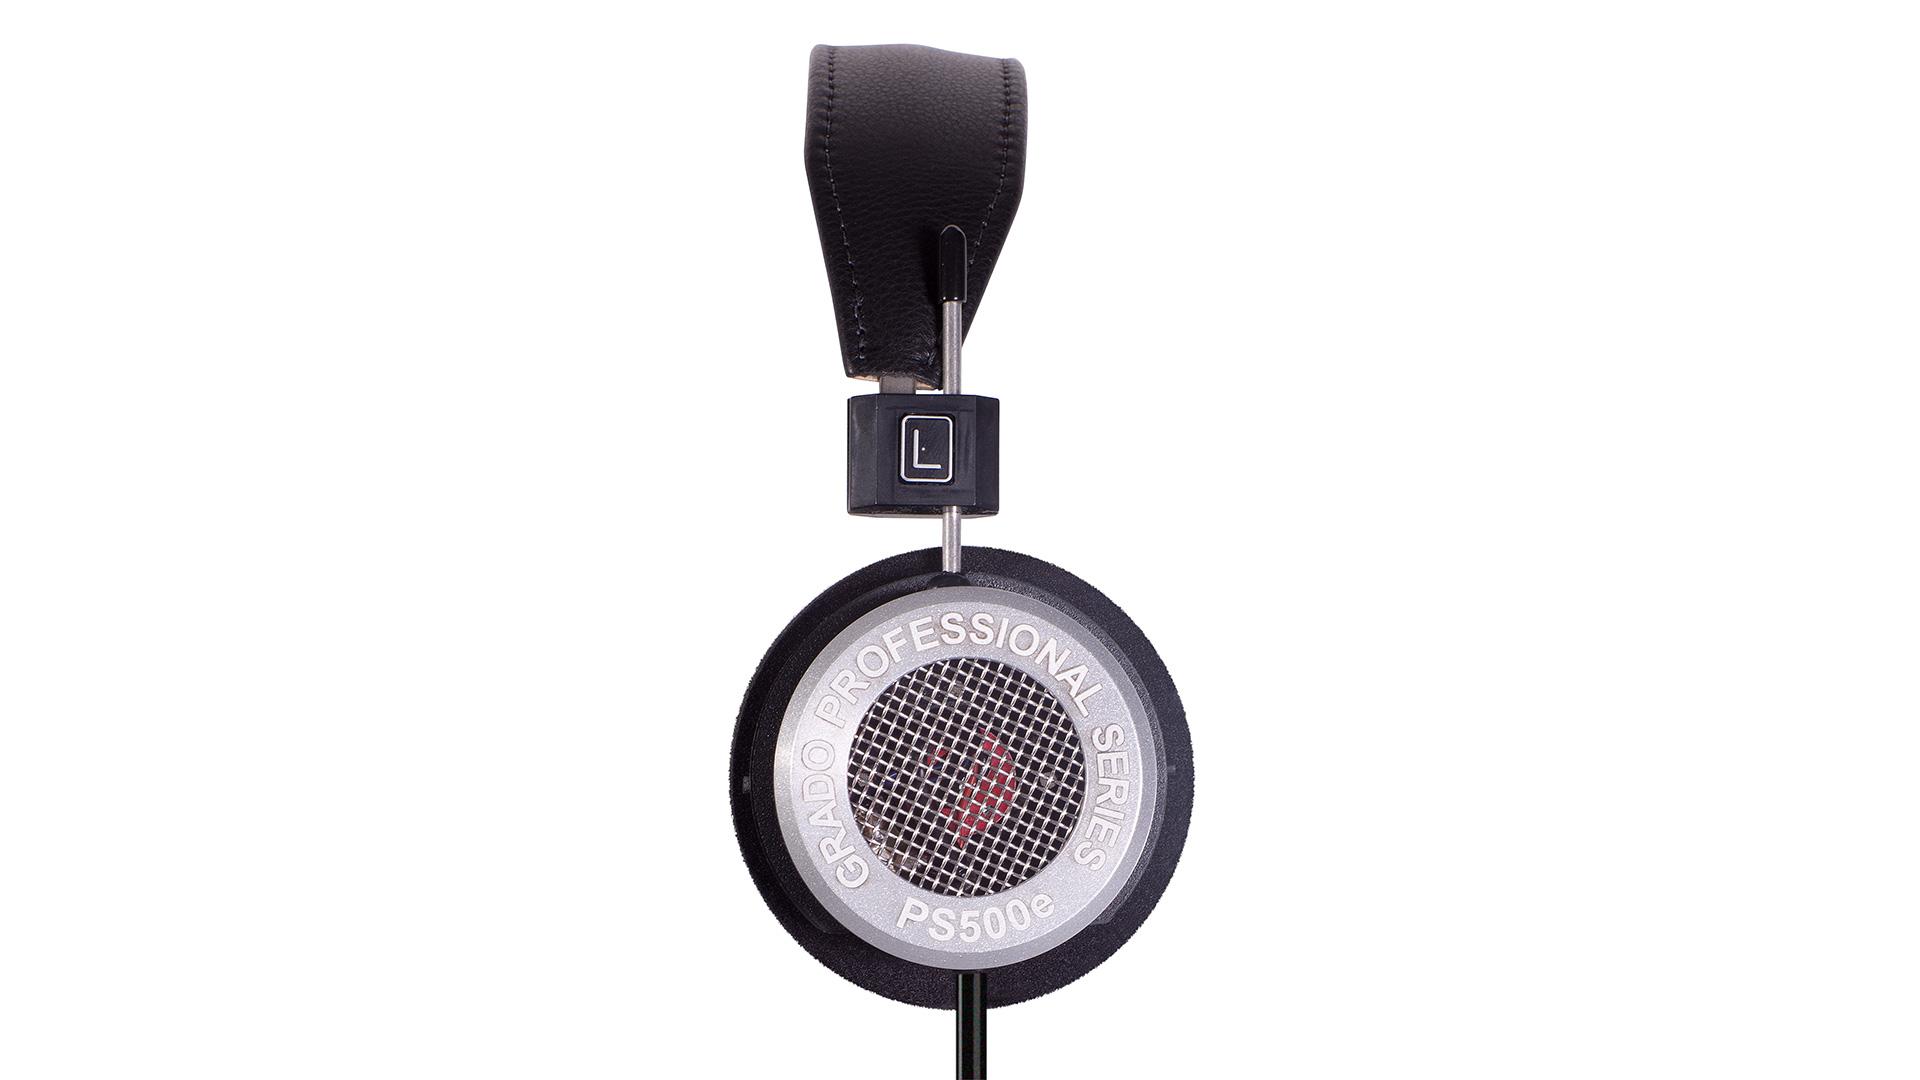 Grado PS500e Headphones in Winnipeg at Creative Audio